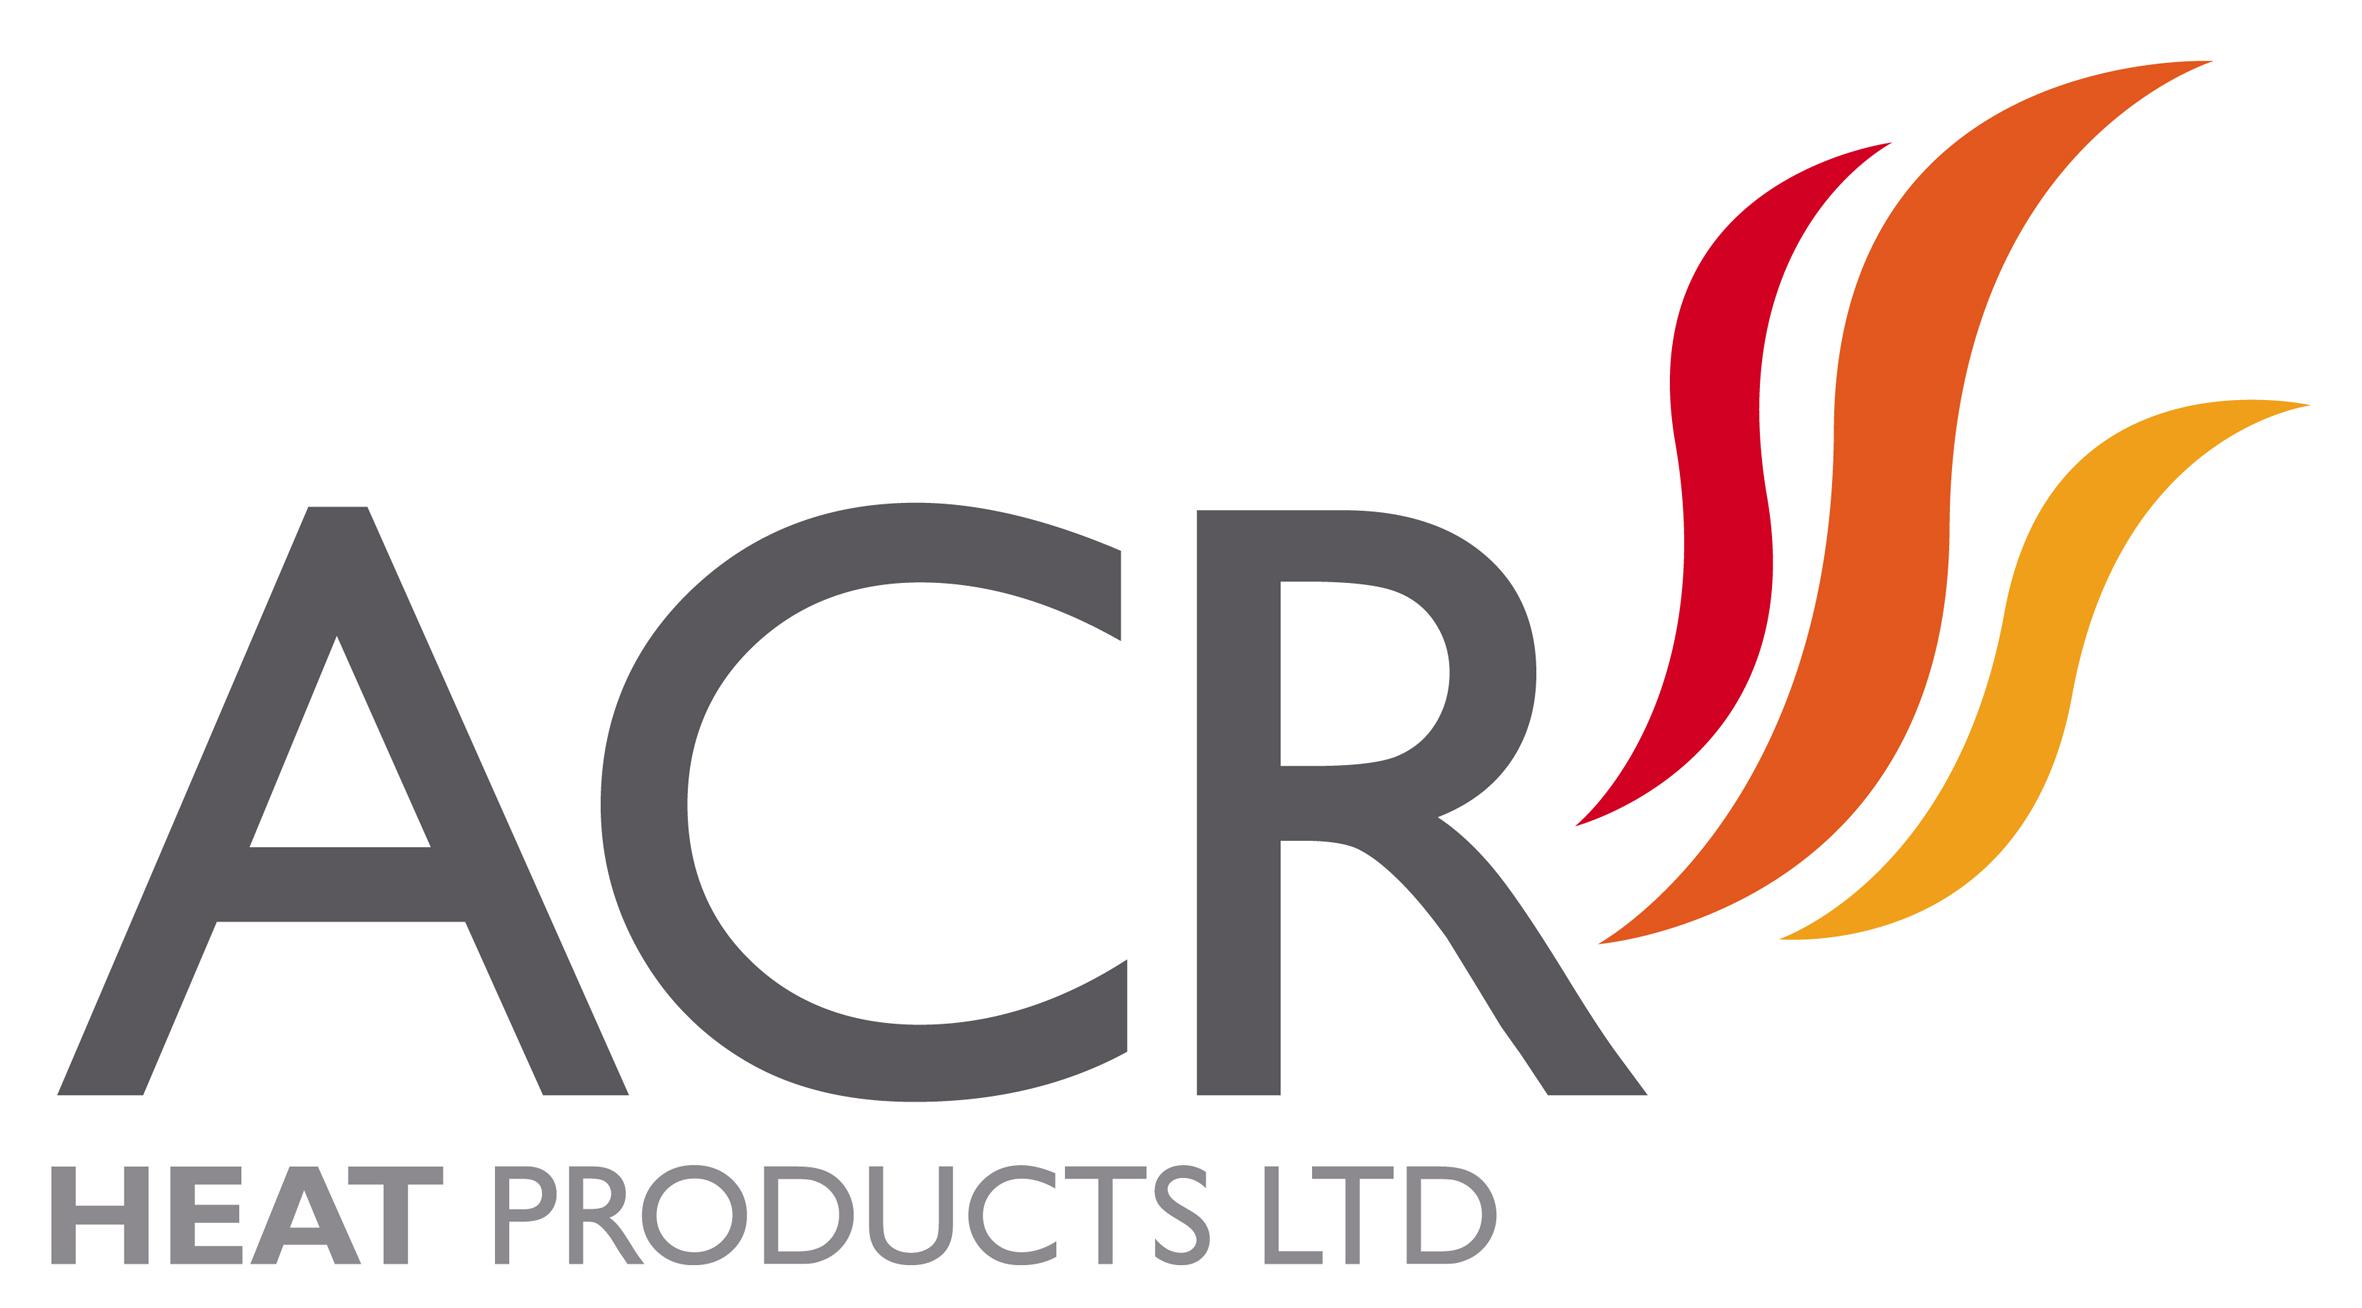 acr-logo-rgb-2jpg